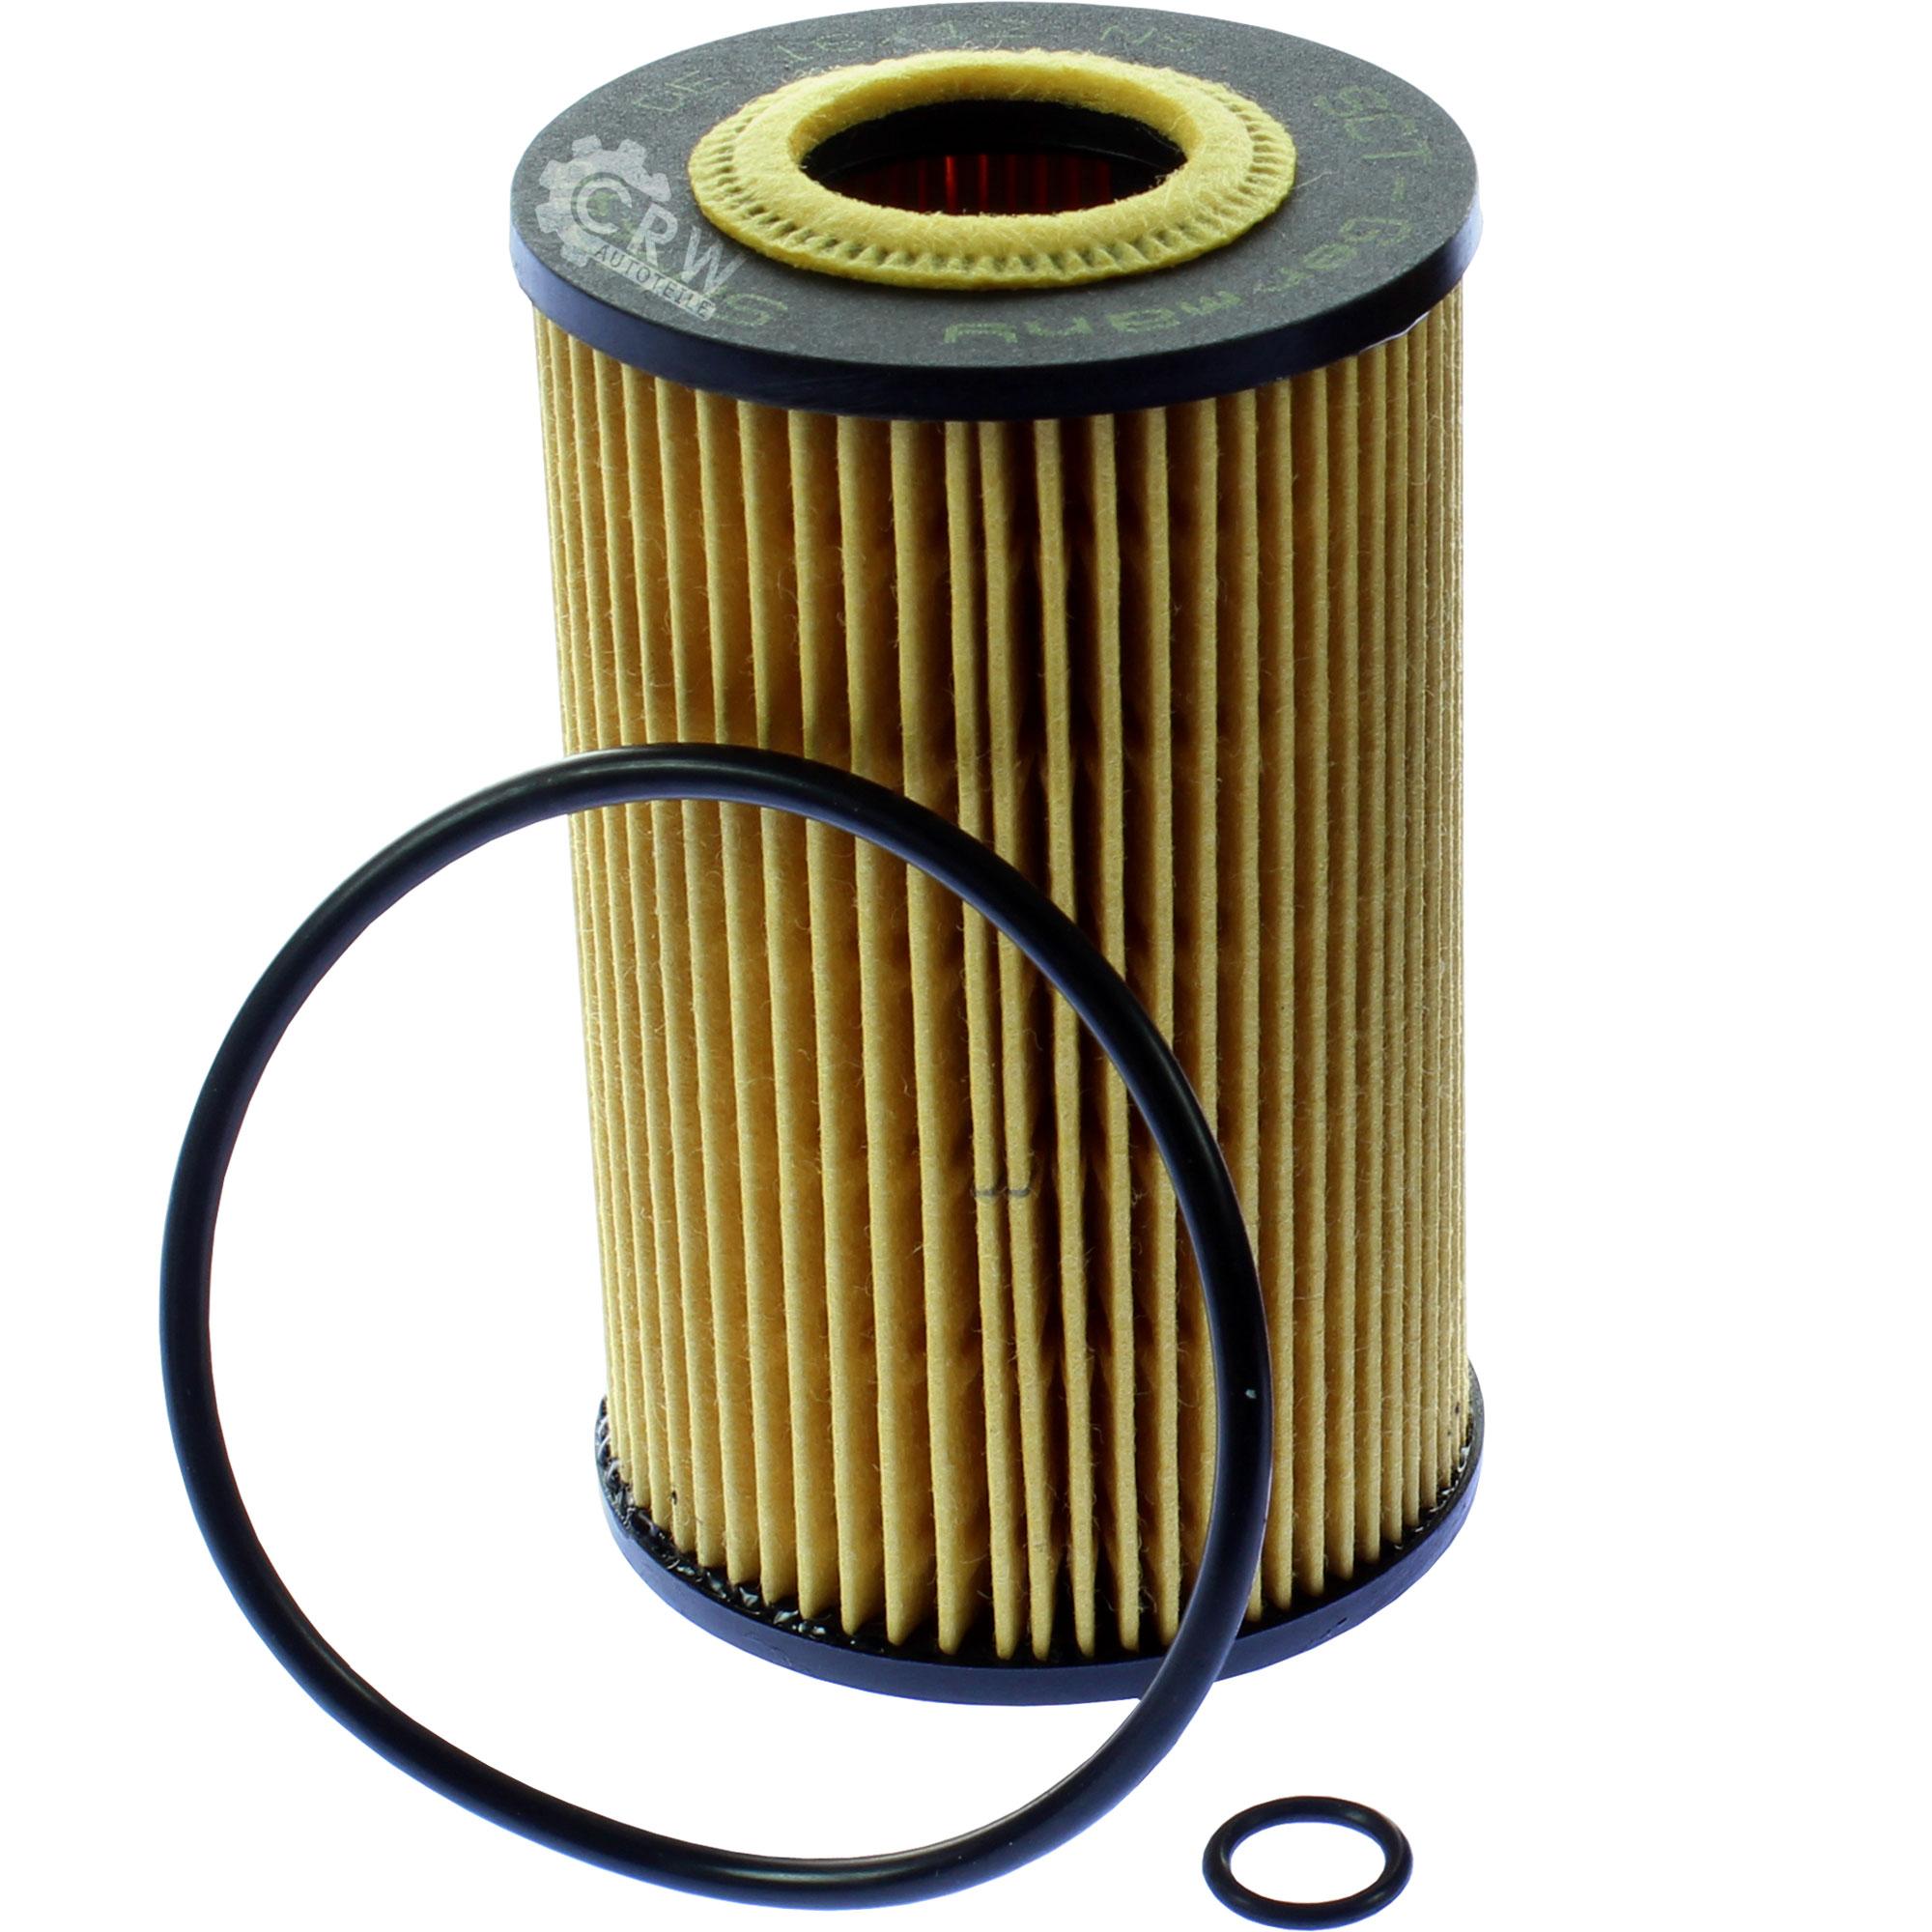 Cambio-de-aceite-set-5l-MANNOL-energy-premium-5w-30-aceite-del-motor-filtro-sct-kit-10140076 miniatura 12